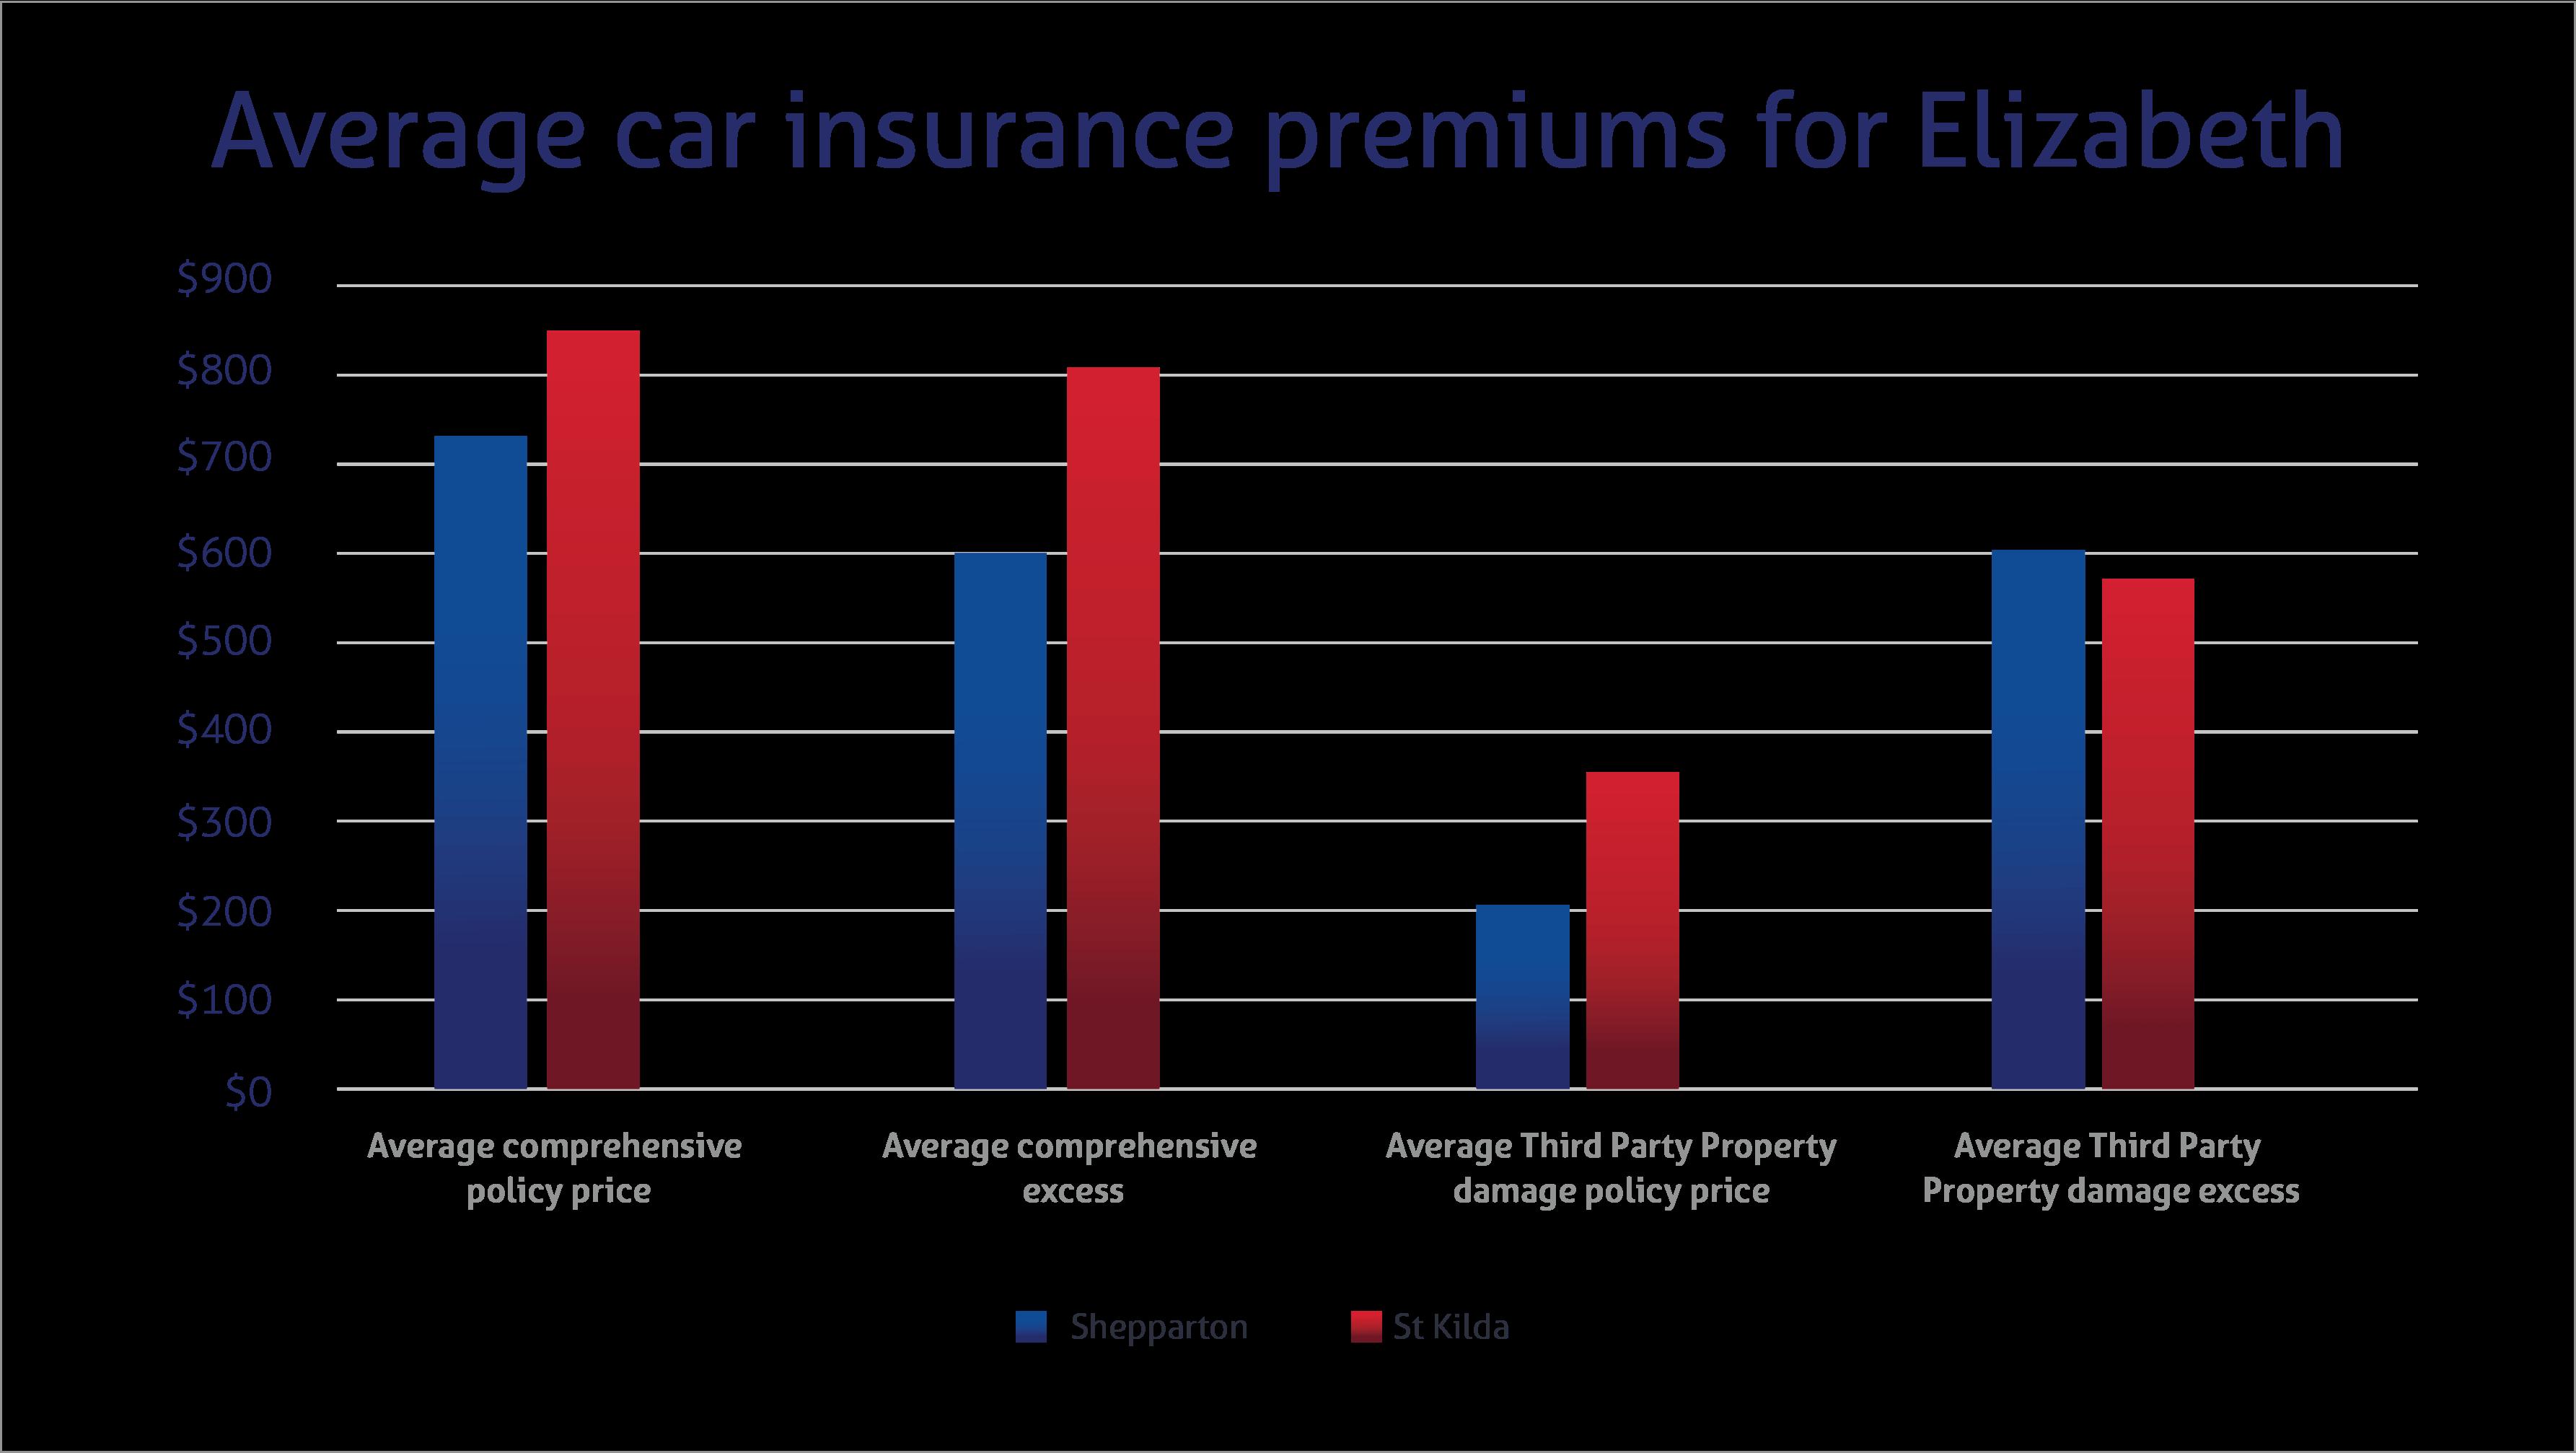 Average car insurance premiums in Victoria